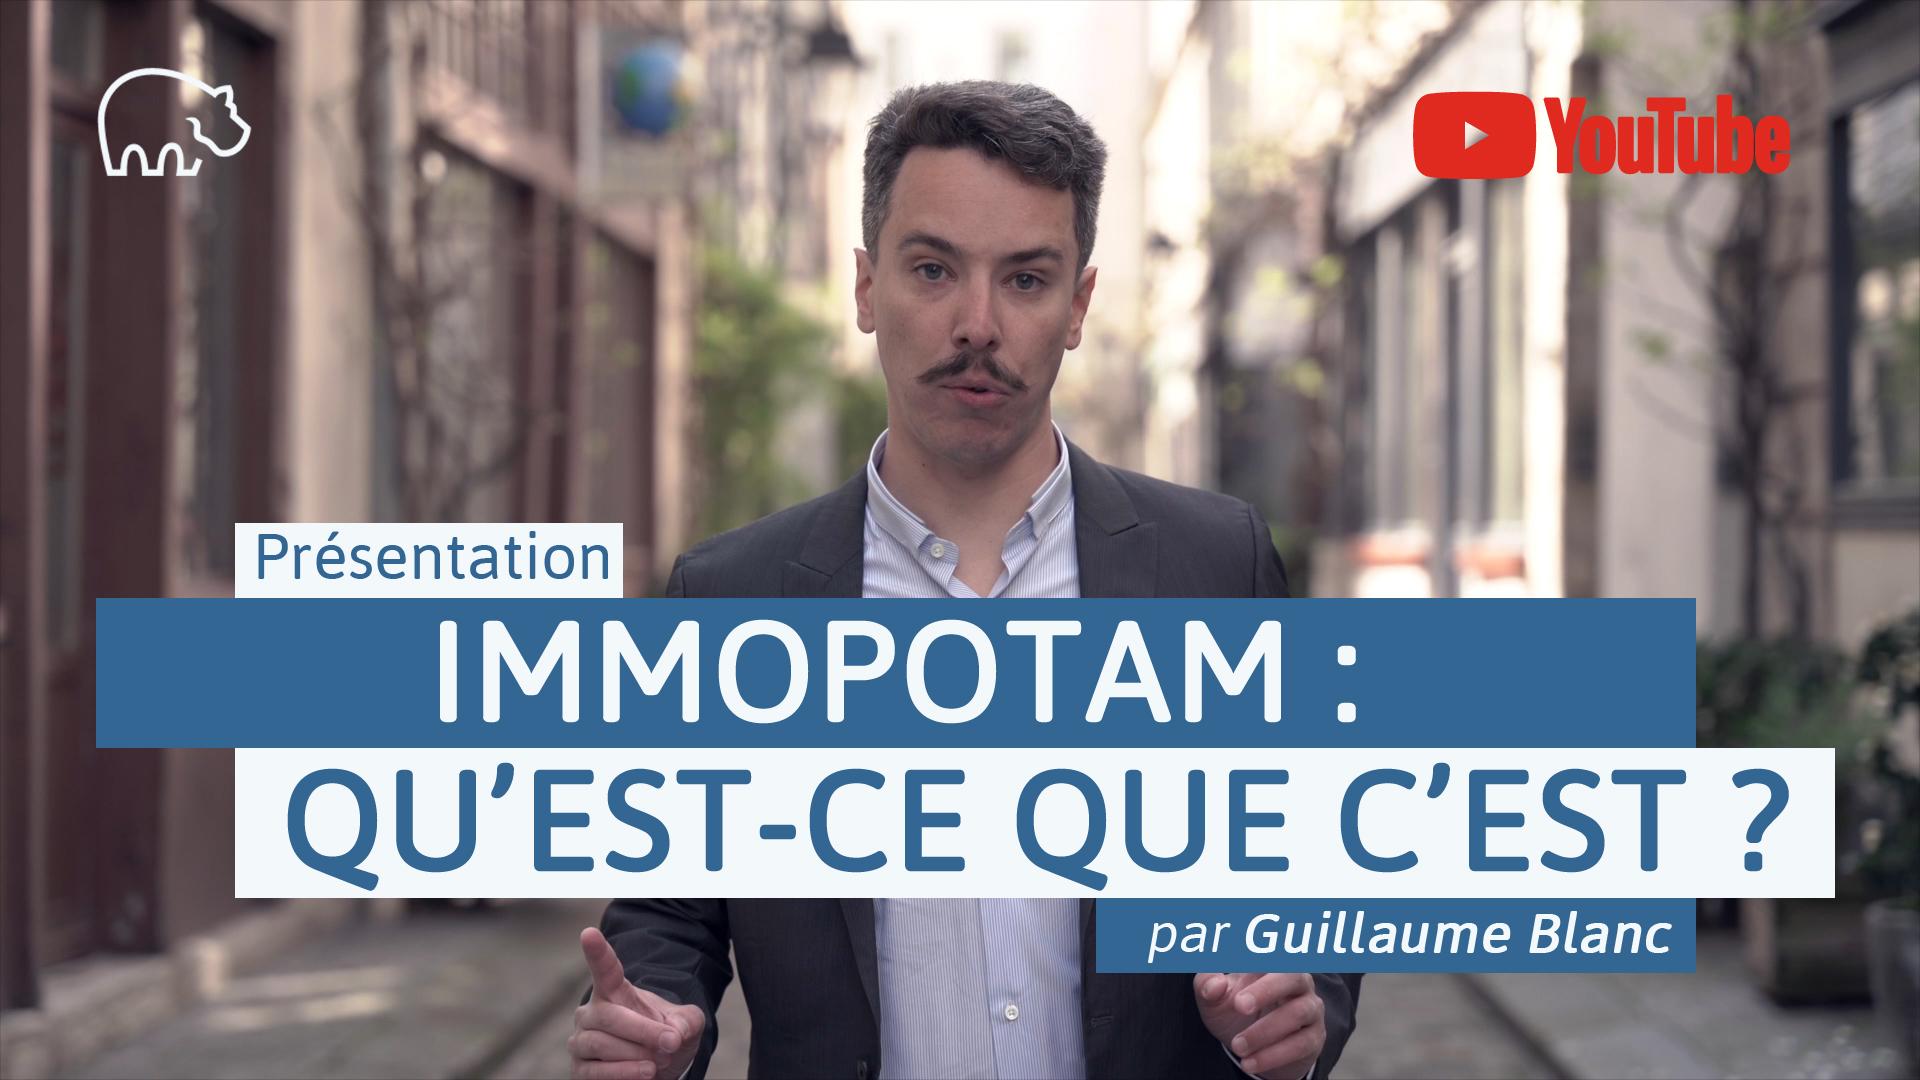 S1E0 - Bannière illustration - ImmoPotamTV - YouTube - Présentation d'ImmoPotam